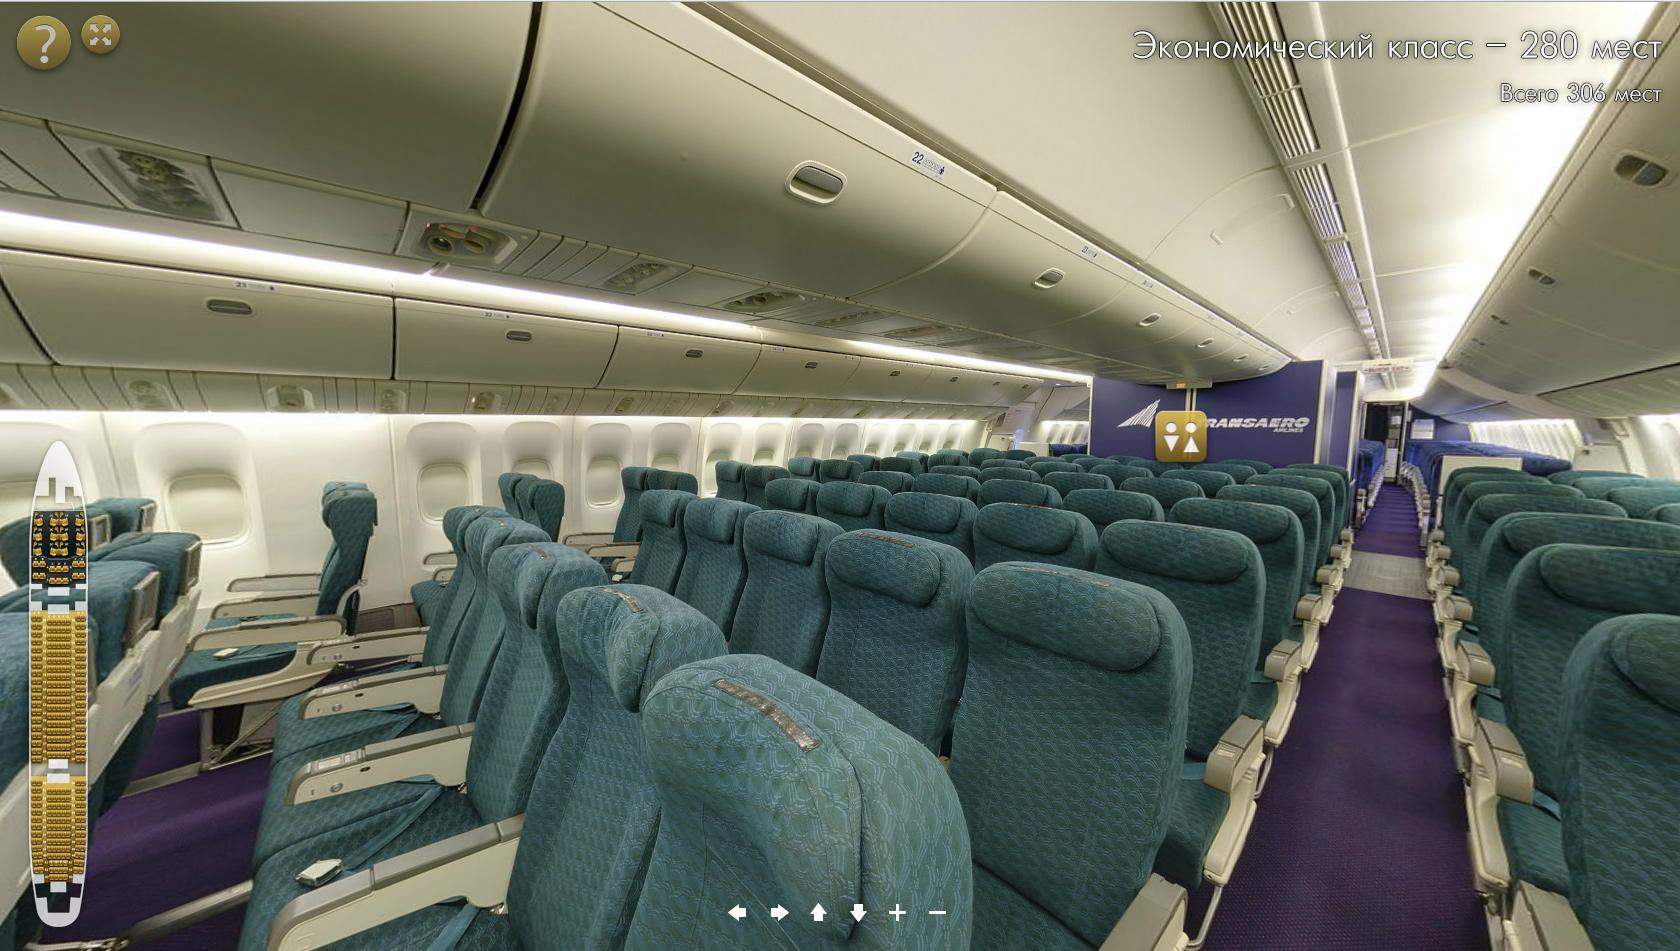 Боинг 777 200 схема салона лучшие места фото 846